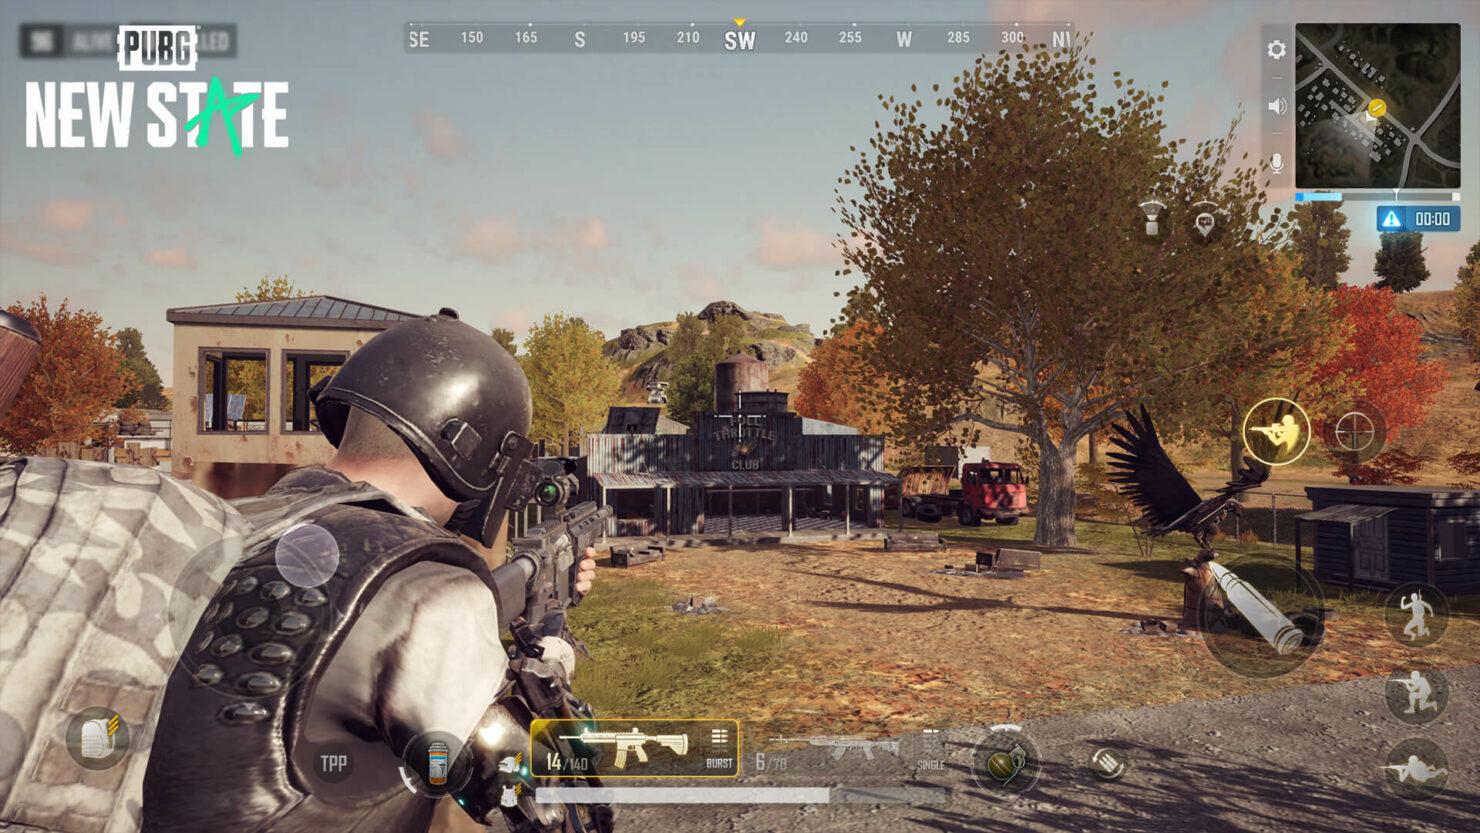 pubg_new_state_screenshot2